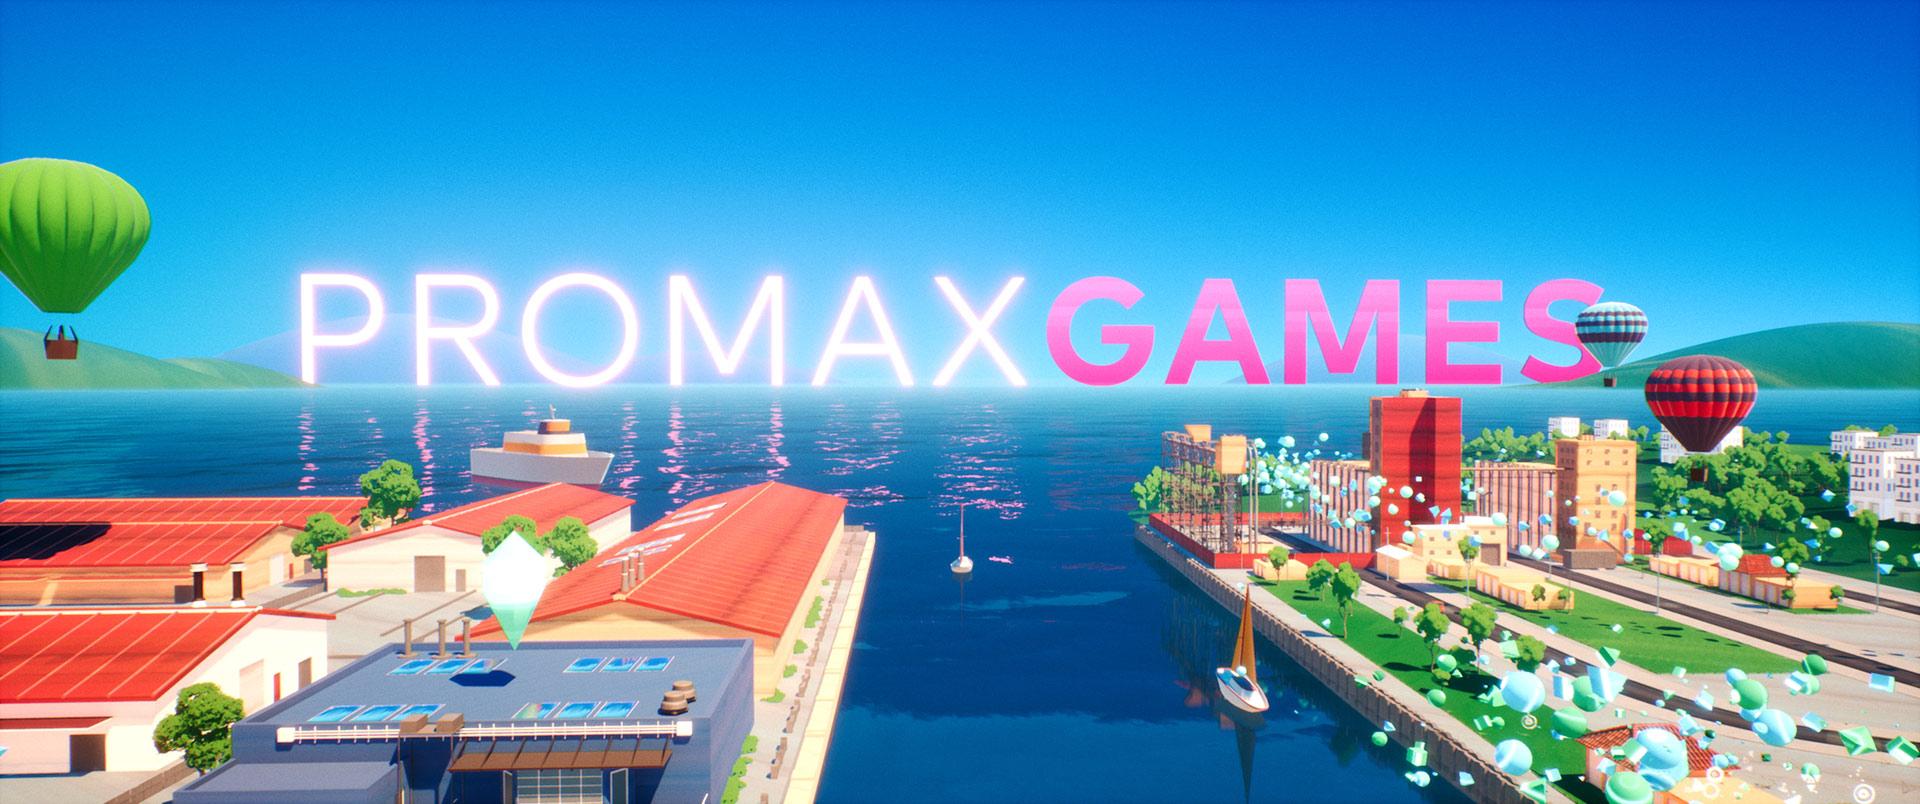 Capacity : PromaxGames